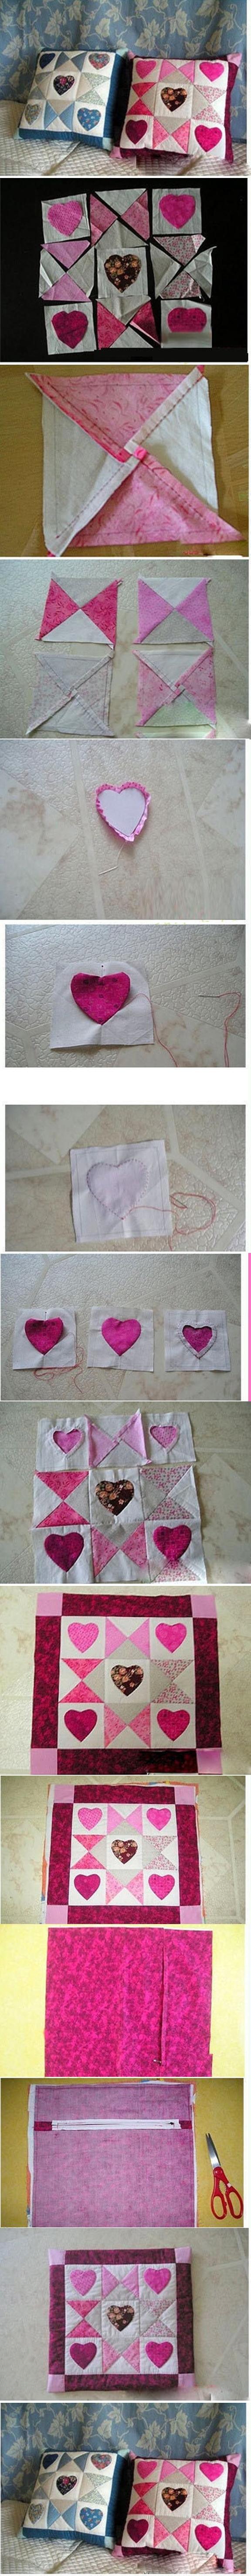 DIY Heart Checker Cushion